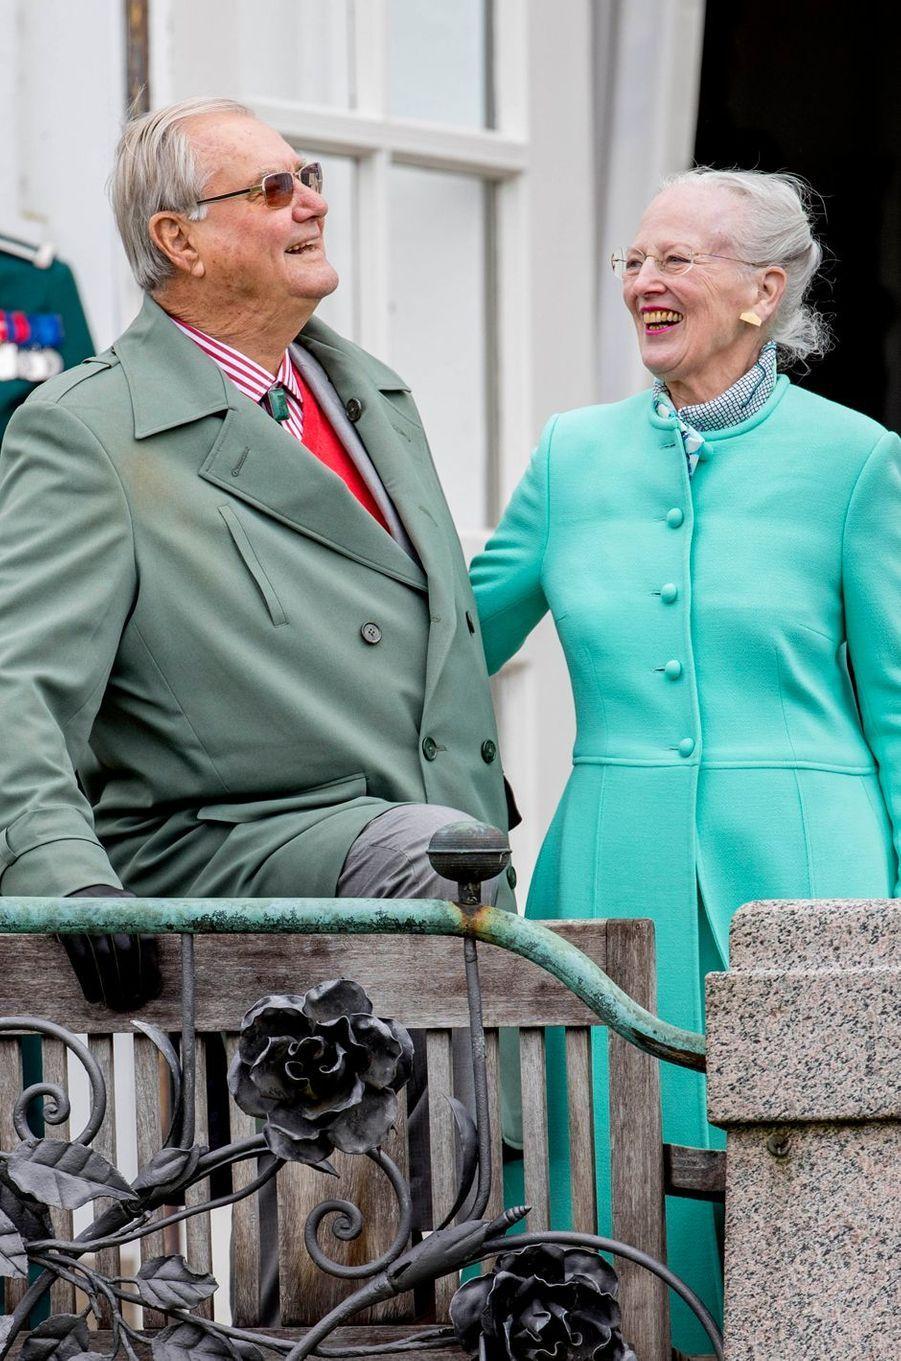 La reine Margrethe II de Danemark et le prince consort Henrik le 16 avril 2017